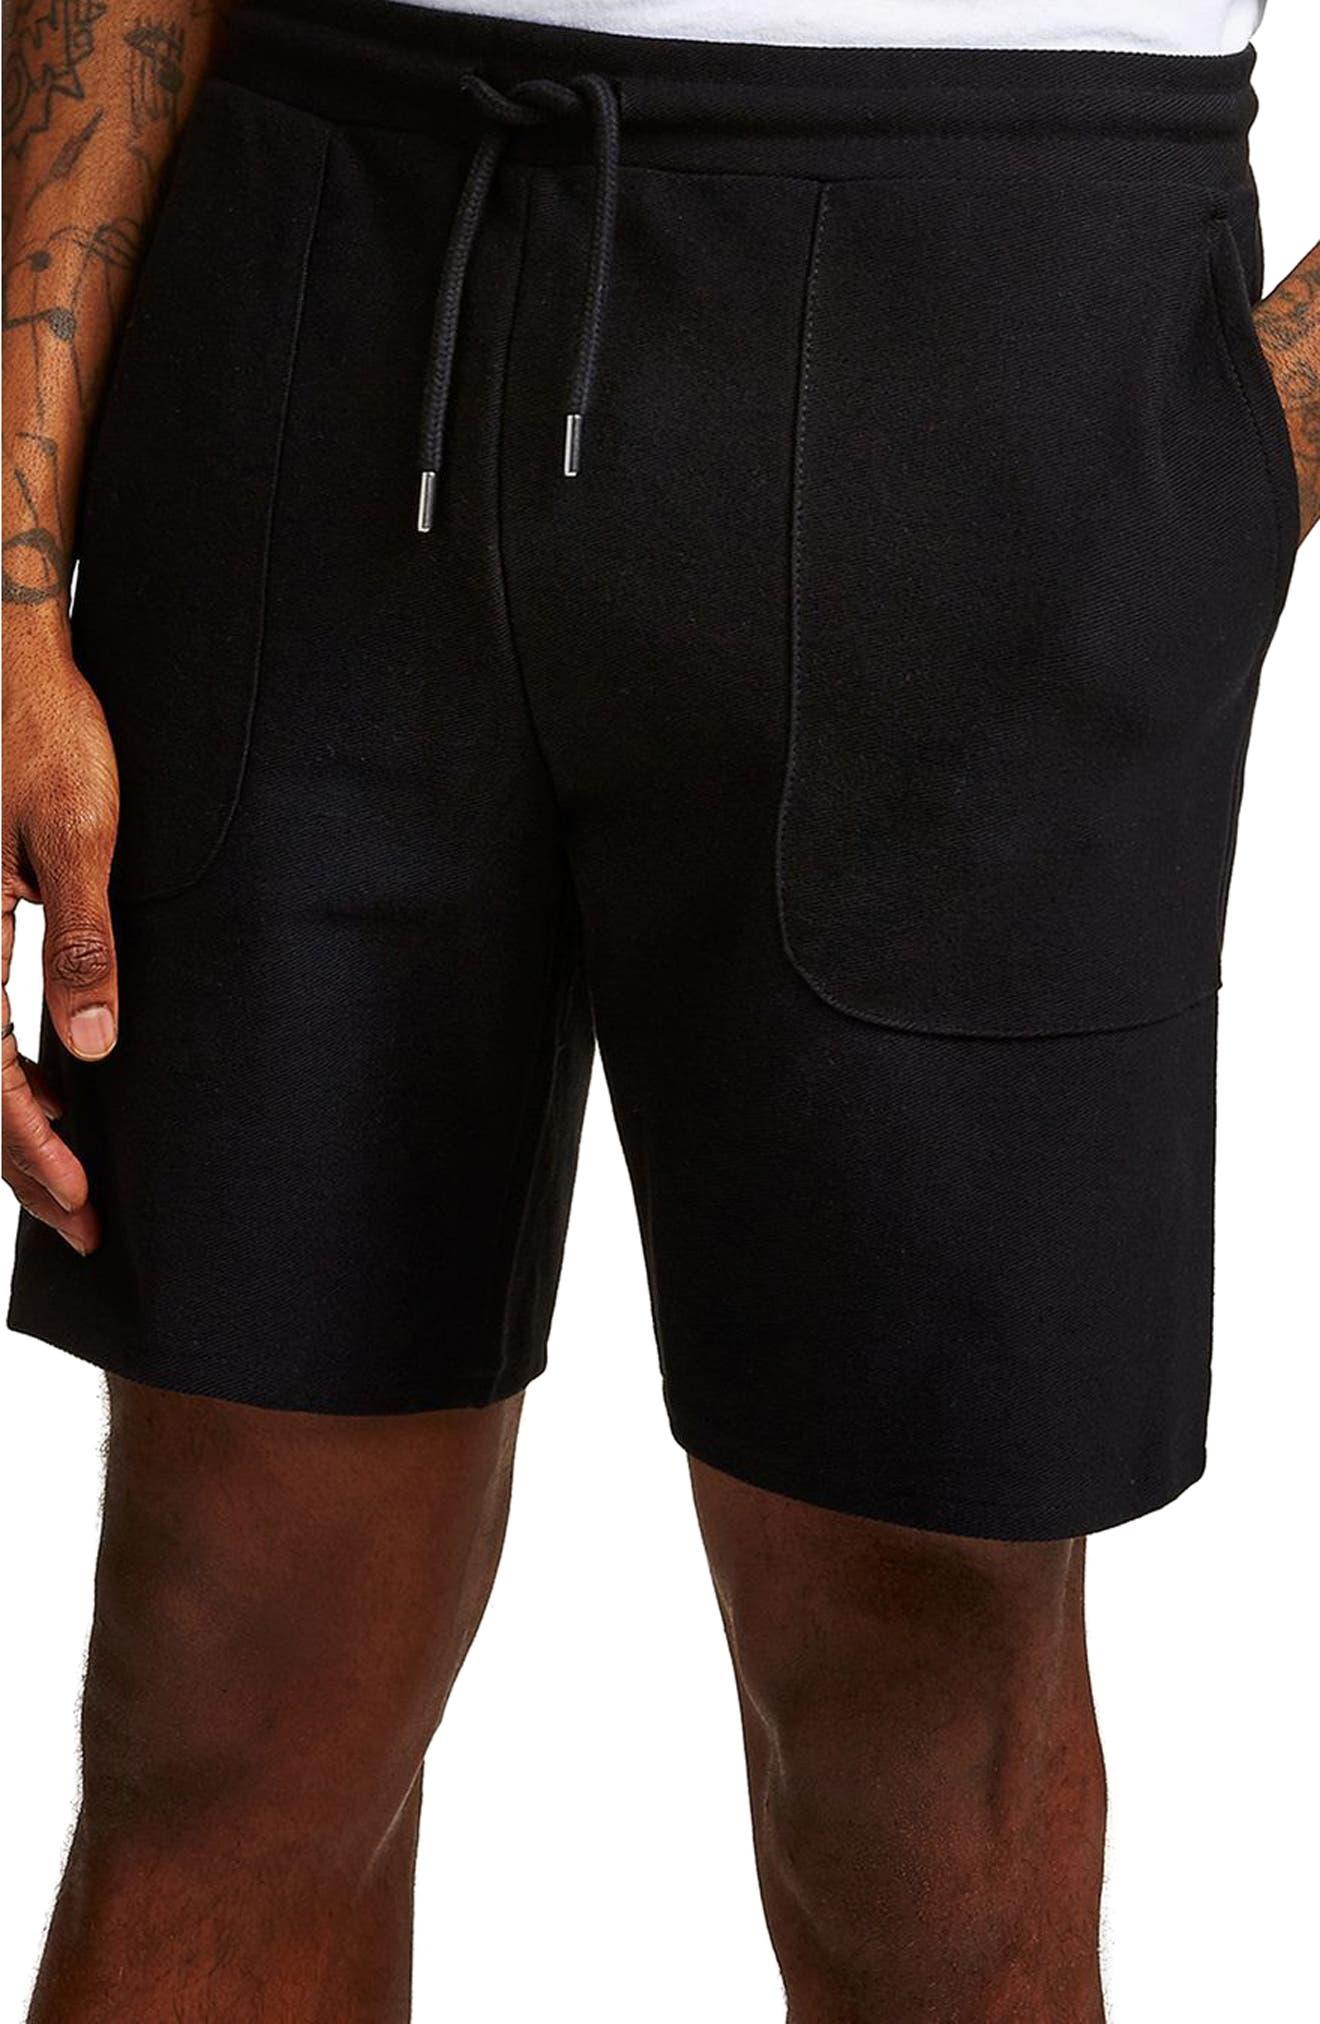 Slim Fit Twill Jersey Shorts,                             Alternate thumbnail 3, color,                             Black